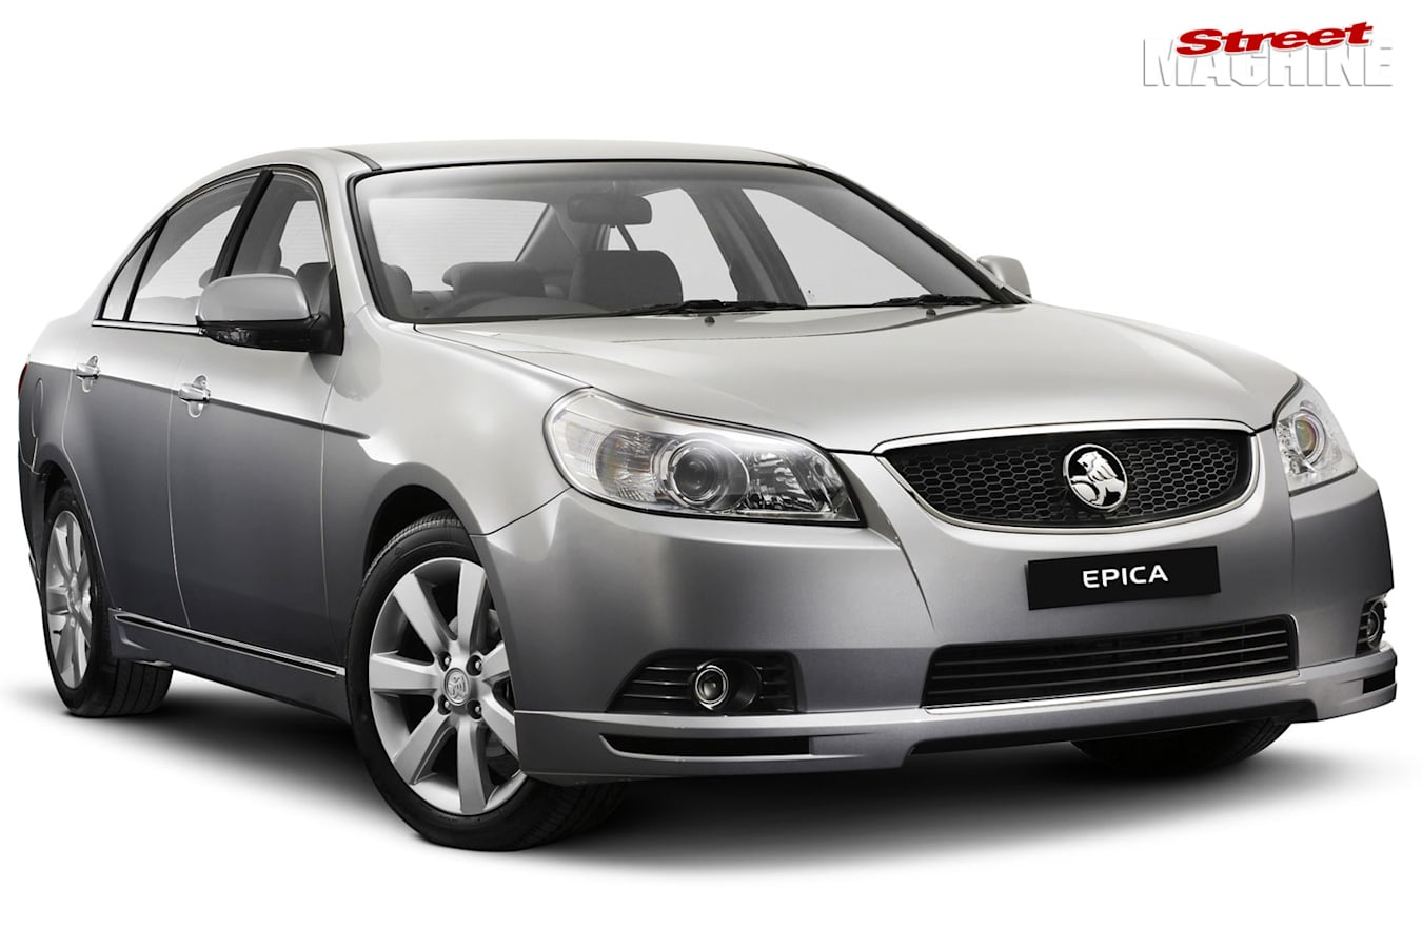 Holden Epica